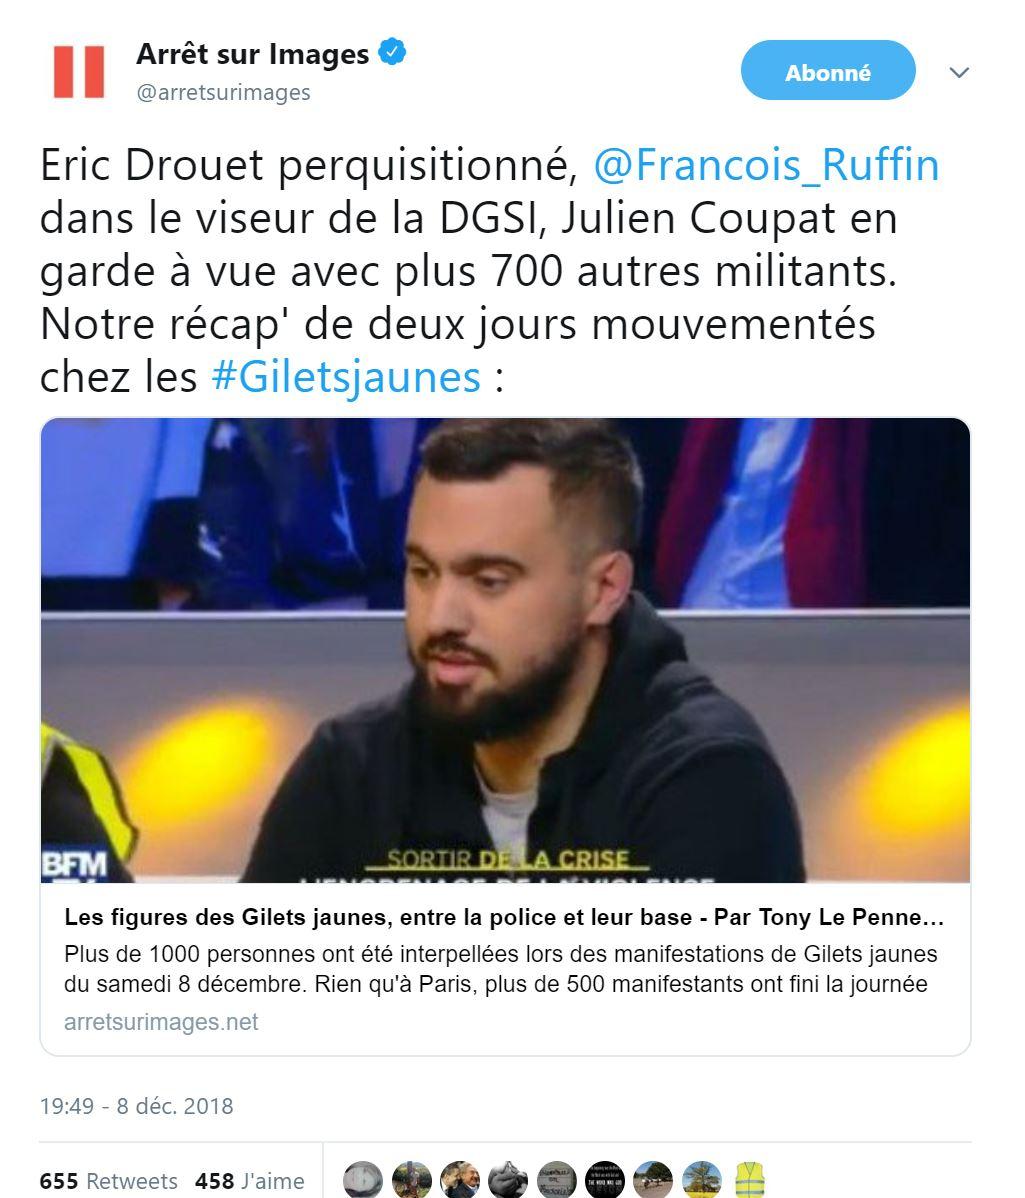 Eric-Drouet-Gilet-Jaune-ruffin-et-coupat-surveilles-pas-DGSI.jpg